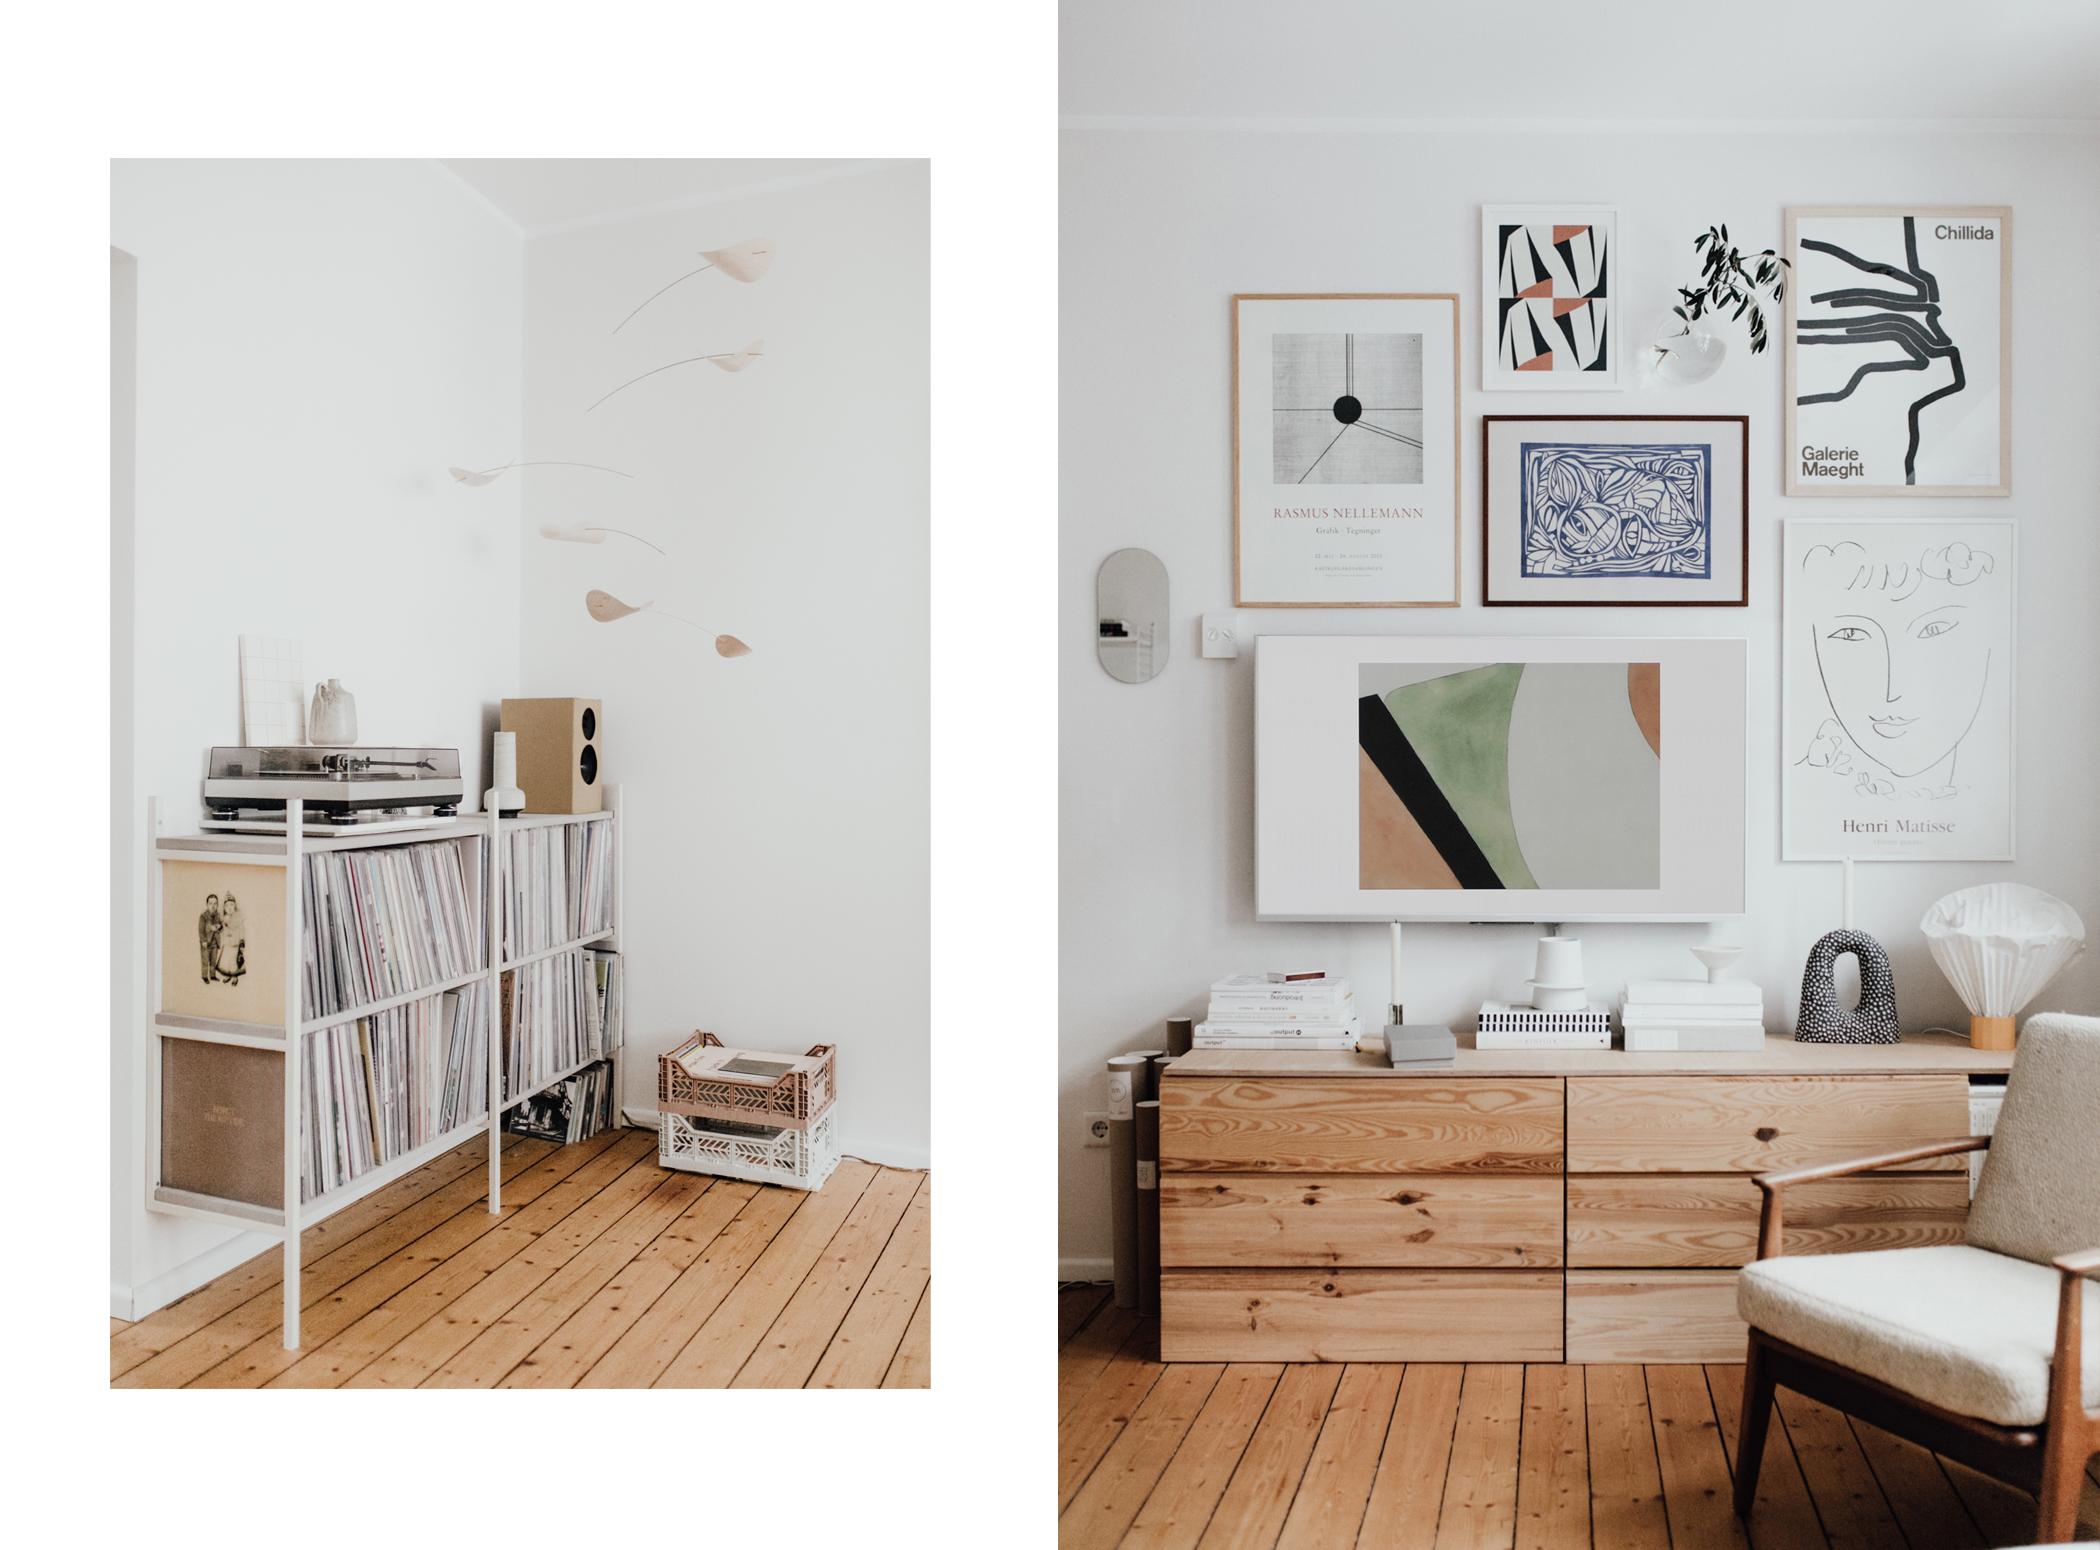 Swantje-und-frieda-homestory_020